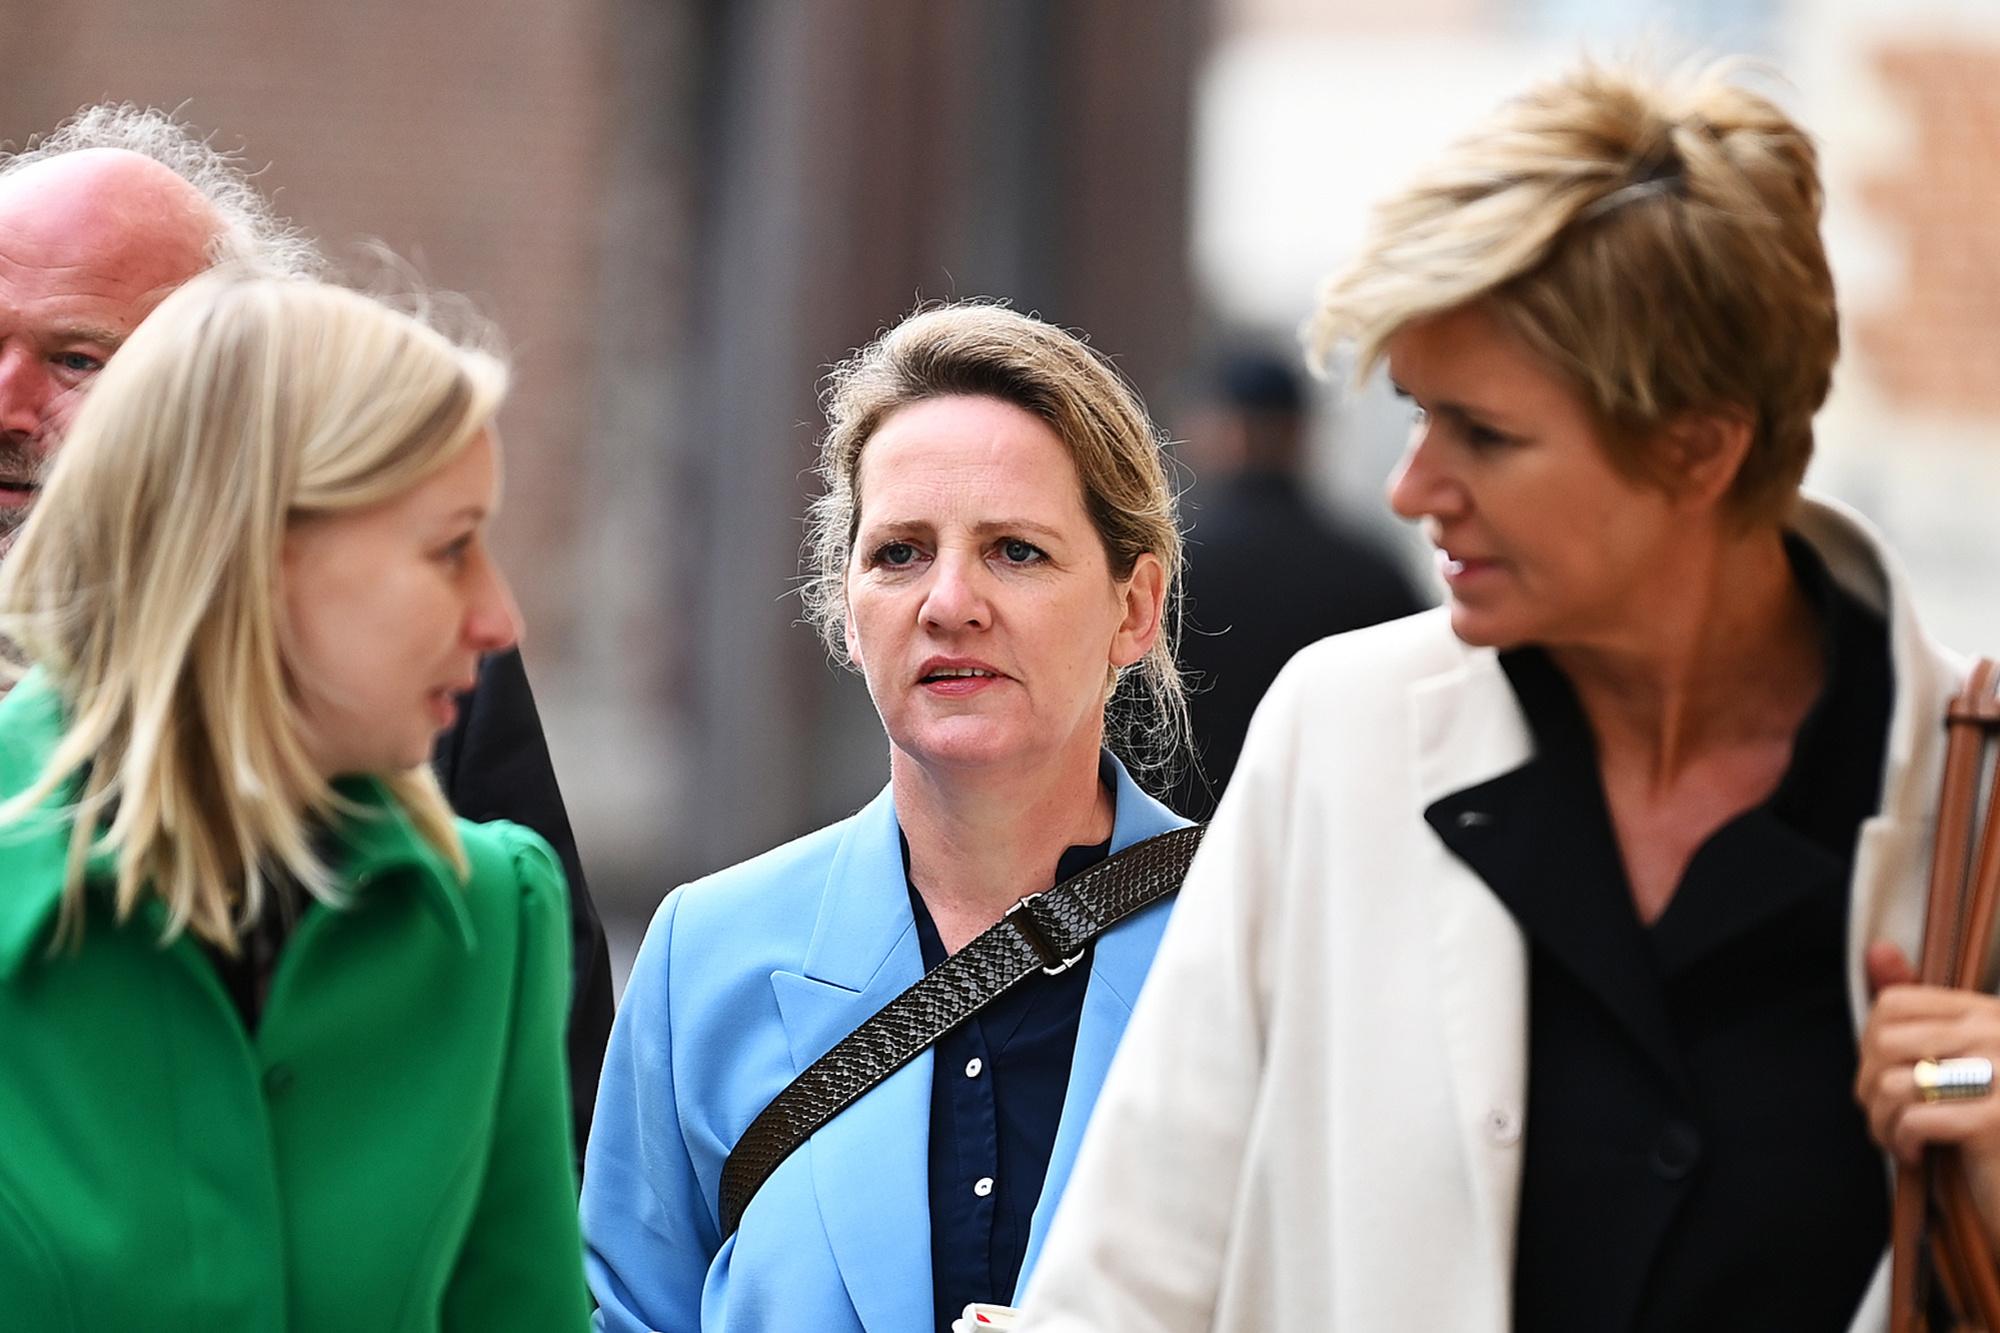 An-Sofie Raes (L), Maaike Cafmeyer (M) en Christine Mussche (R), Belga Image